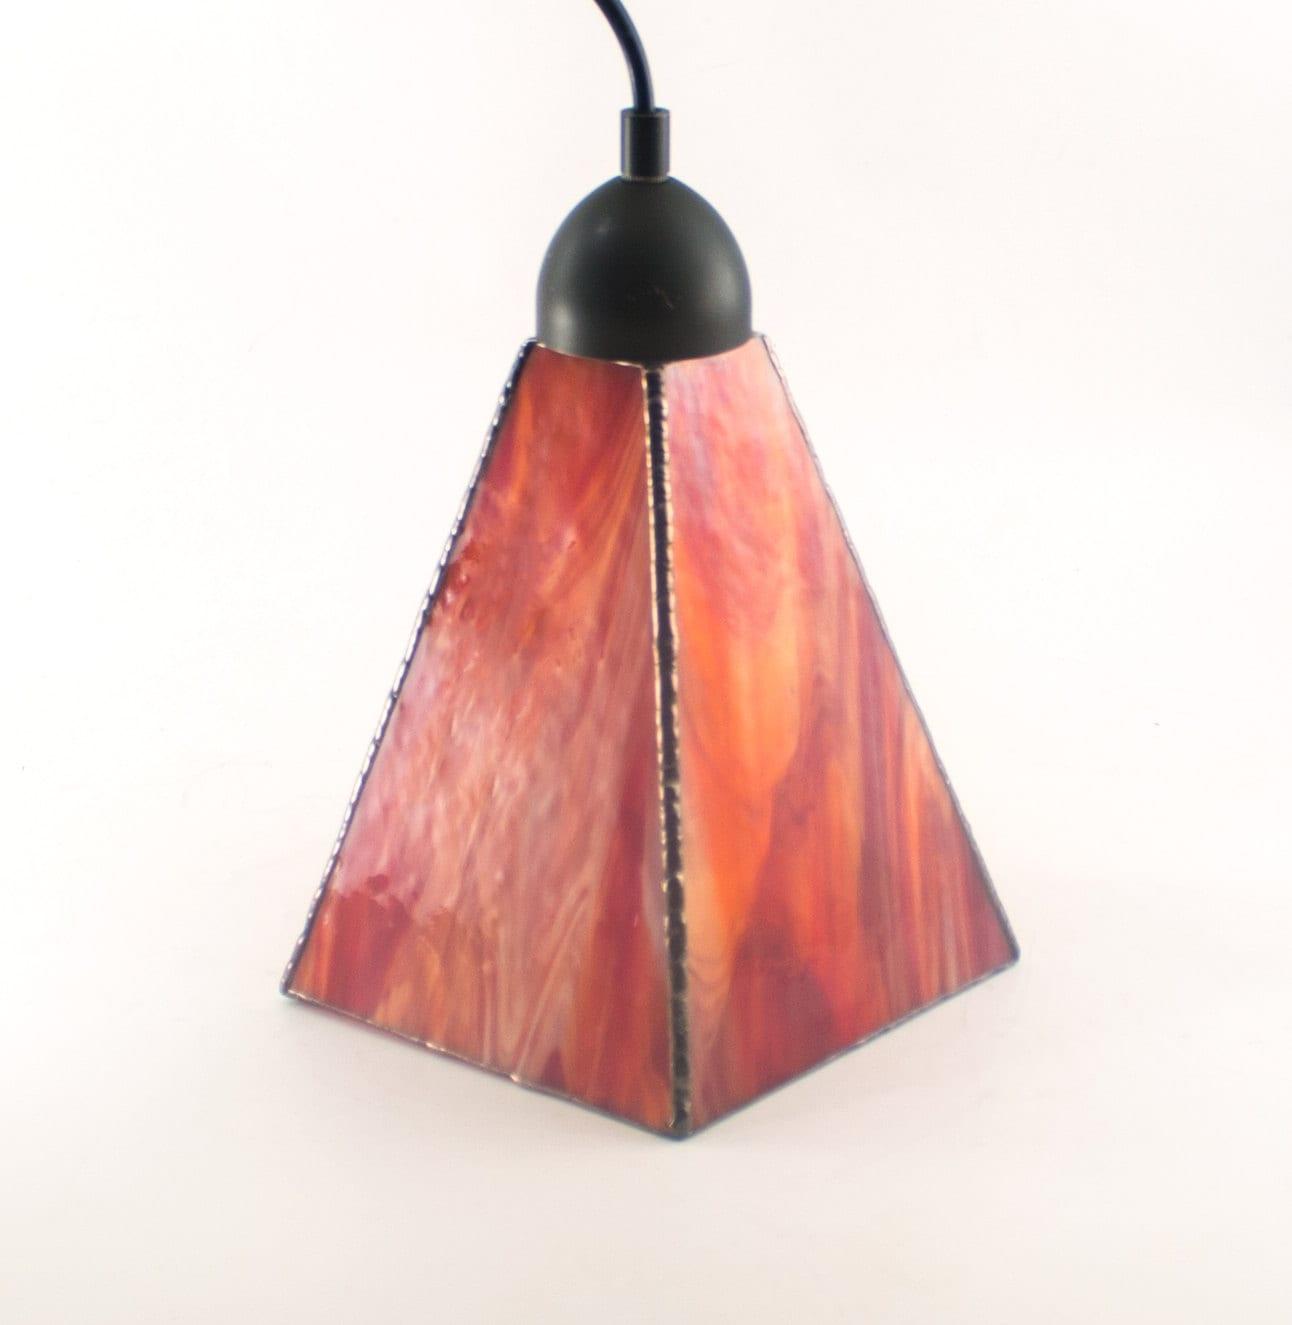 Red Kitchen Lamp: Red Pendant Lighting Kitchen Island Lamp Modern Interior